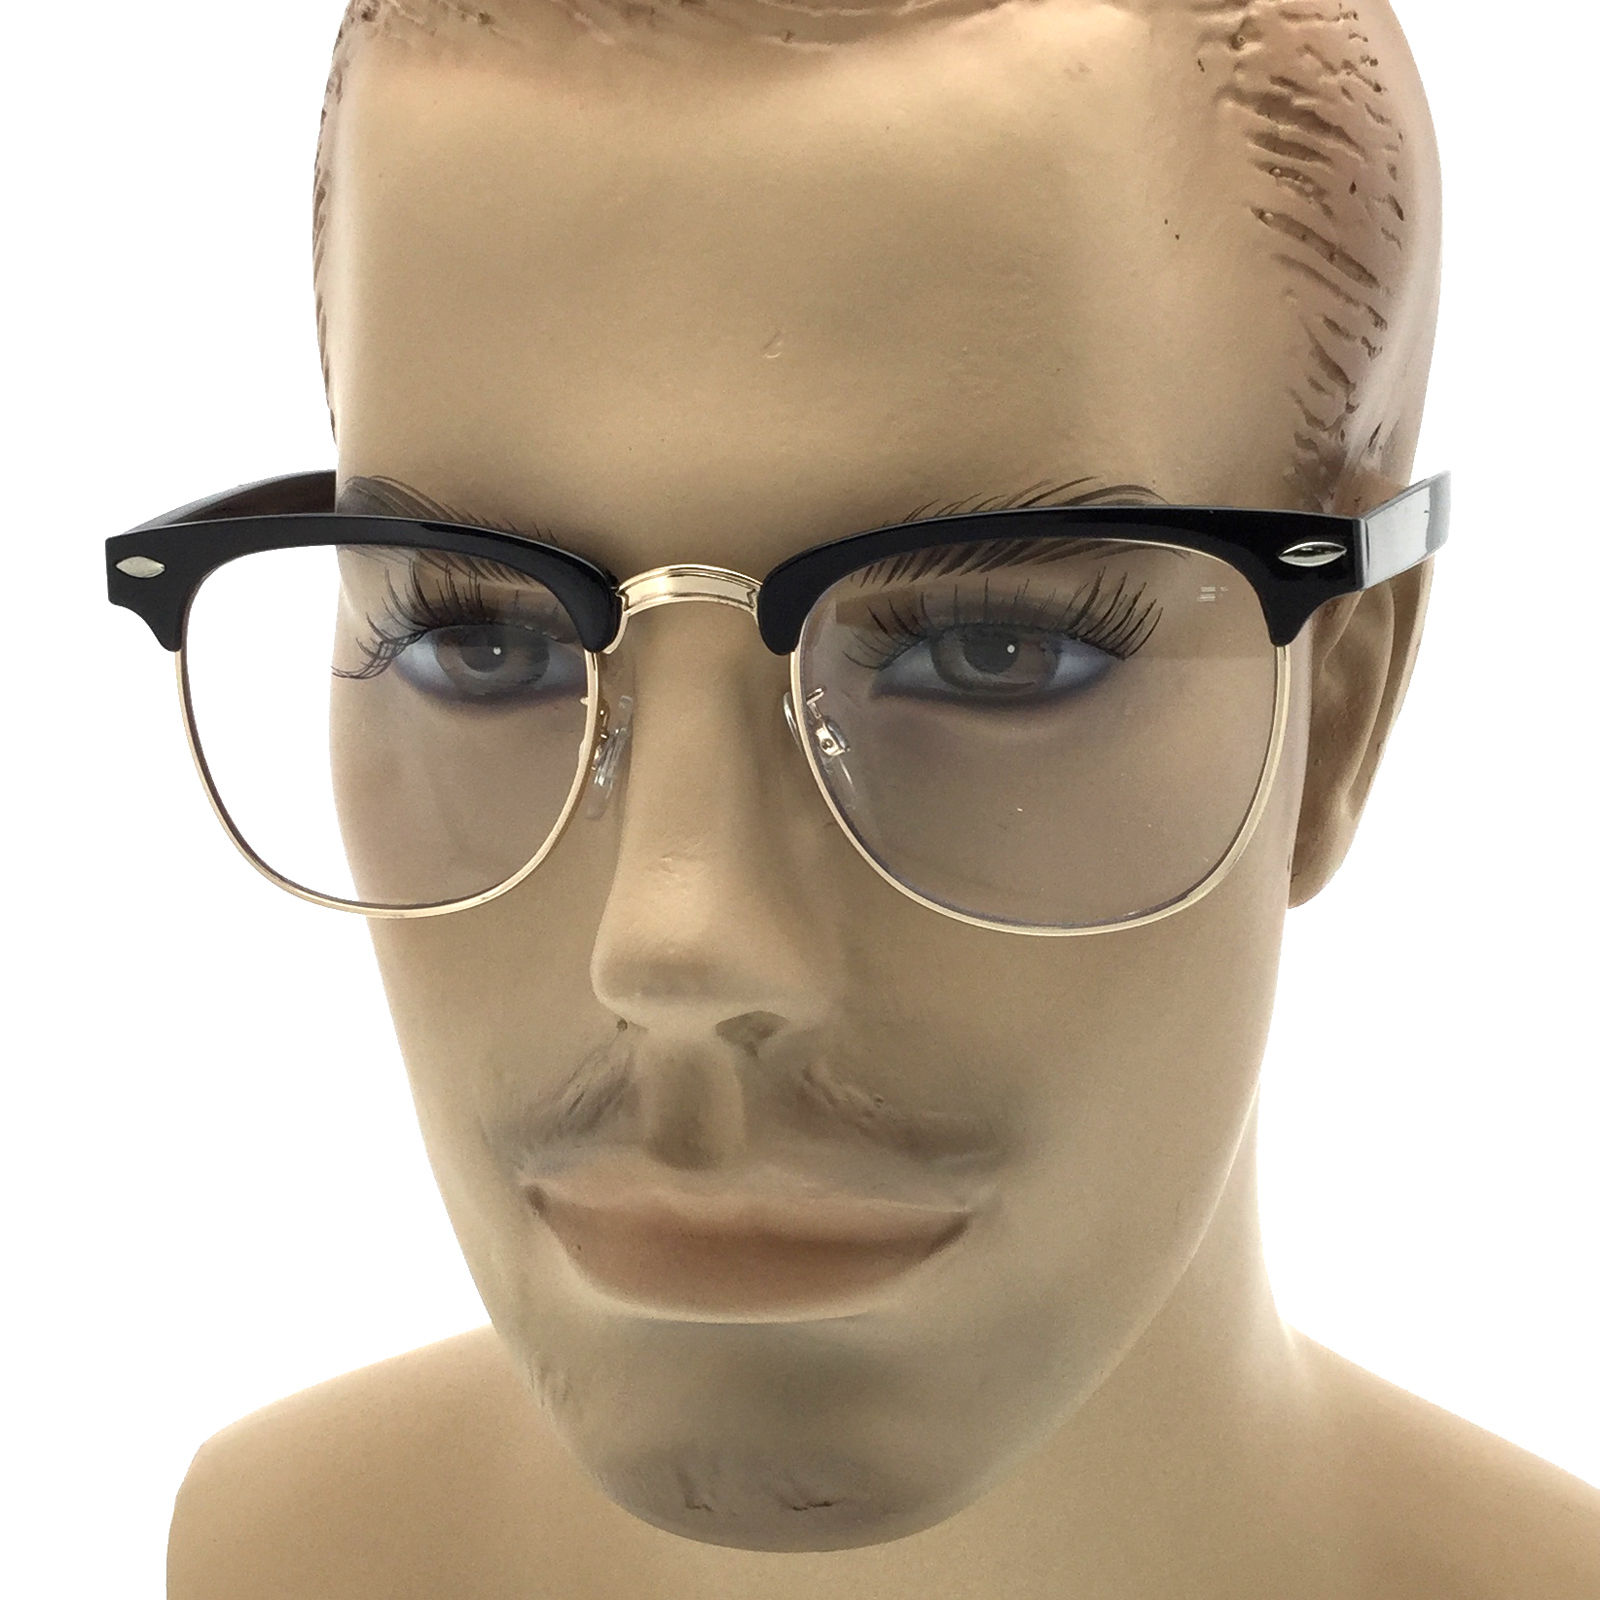 f1249dd4b0 MENS LARGE Frame Non-Rx Fashion Style Glasses Clear Lens Half Frame Retro  Nerd